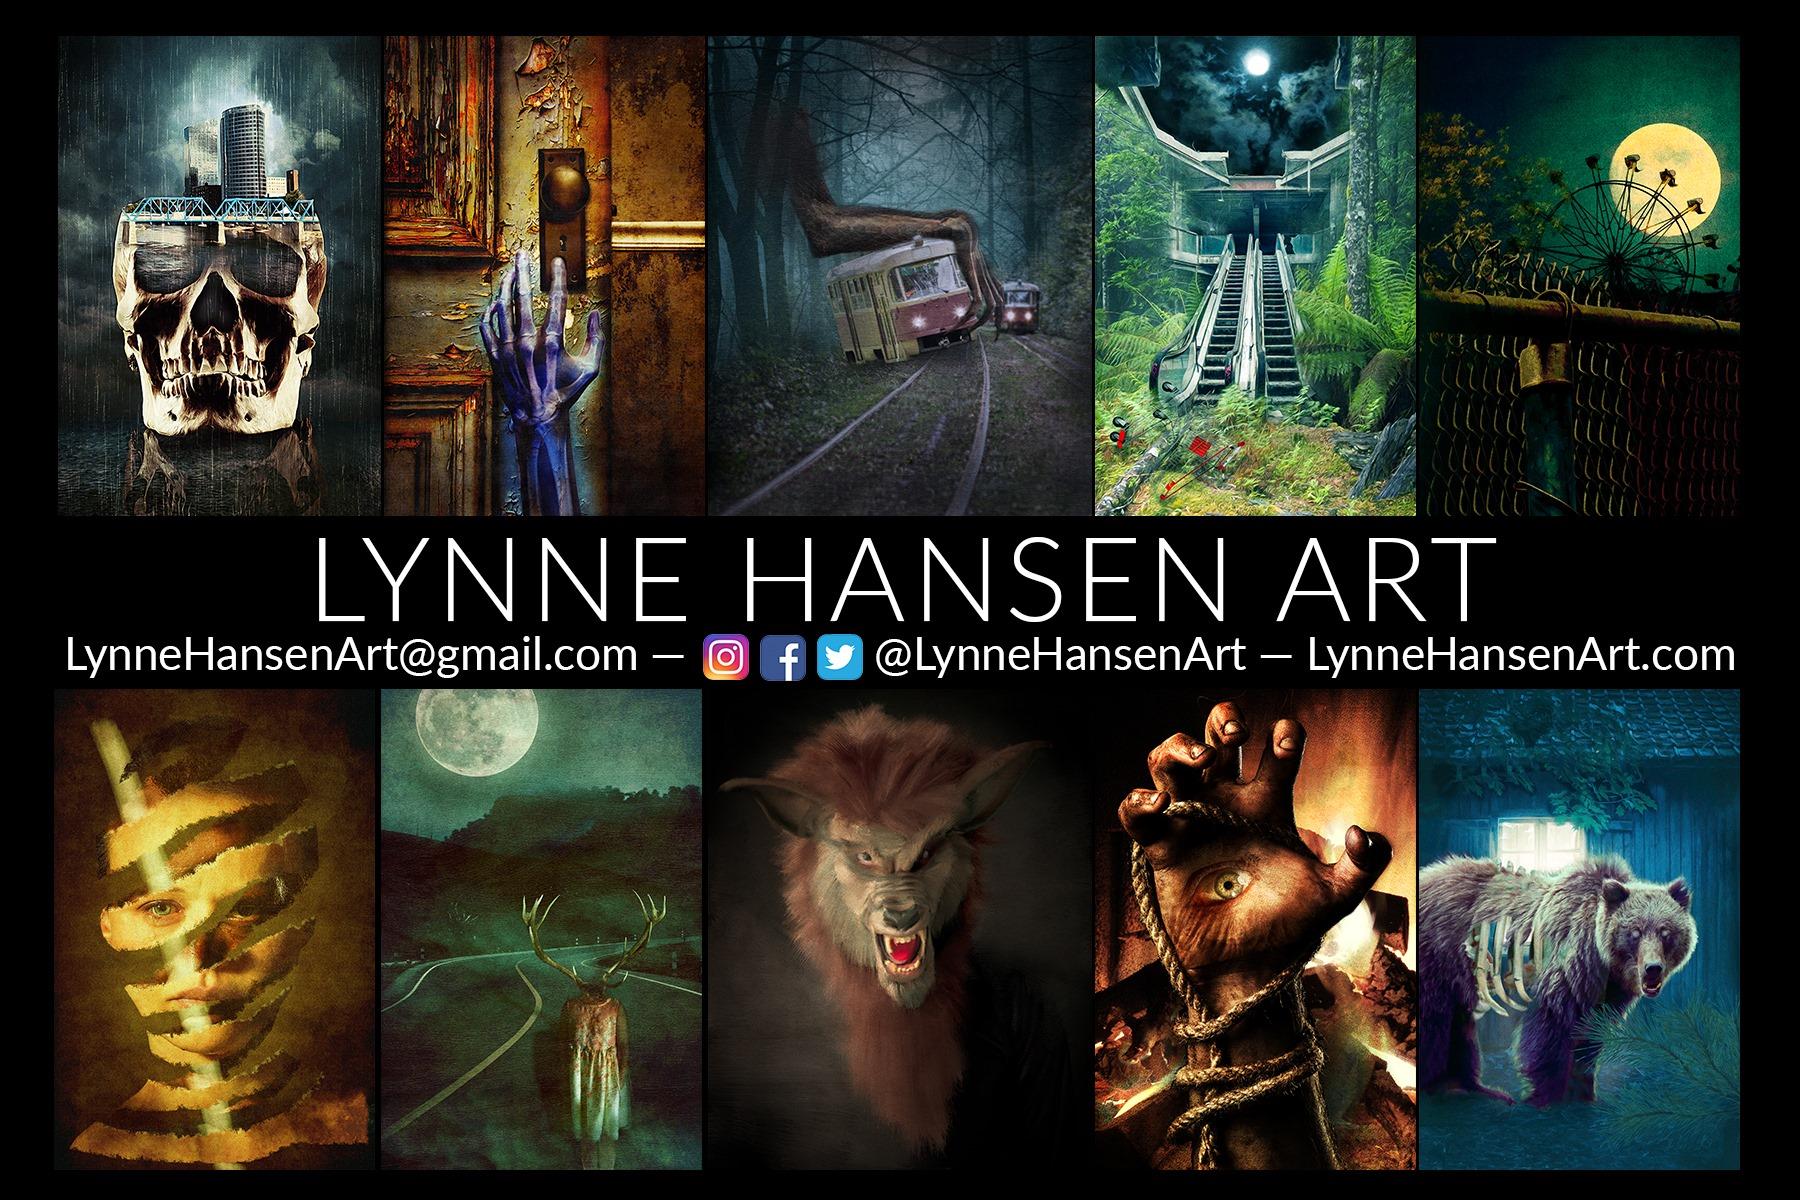 Lynne Hansen Art